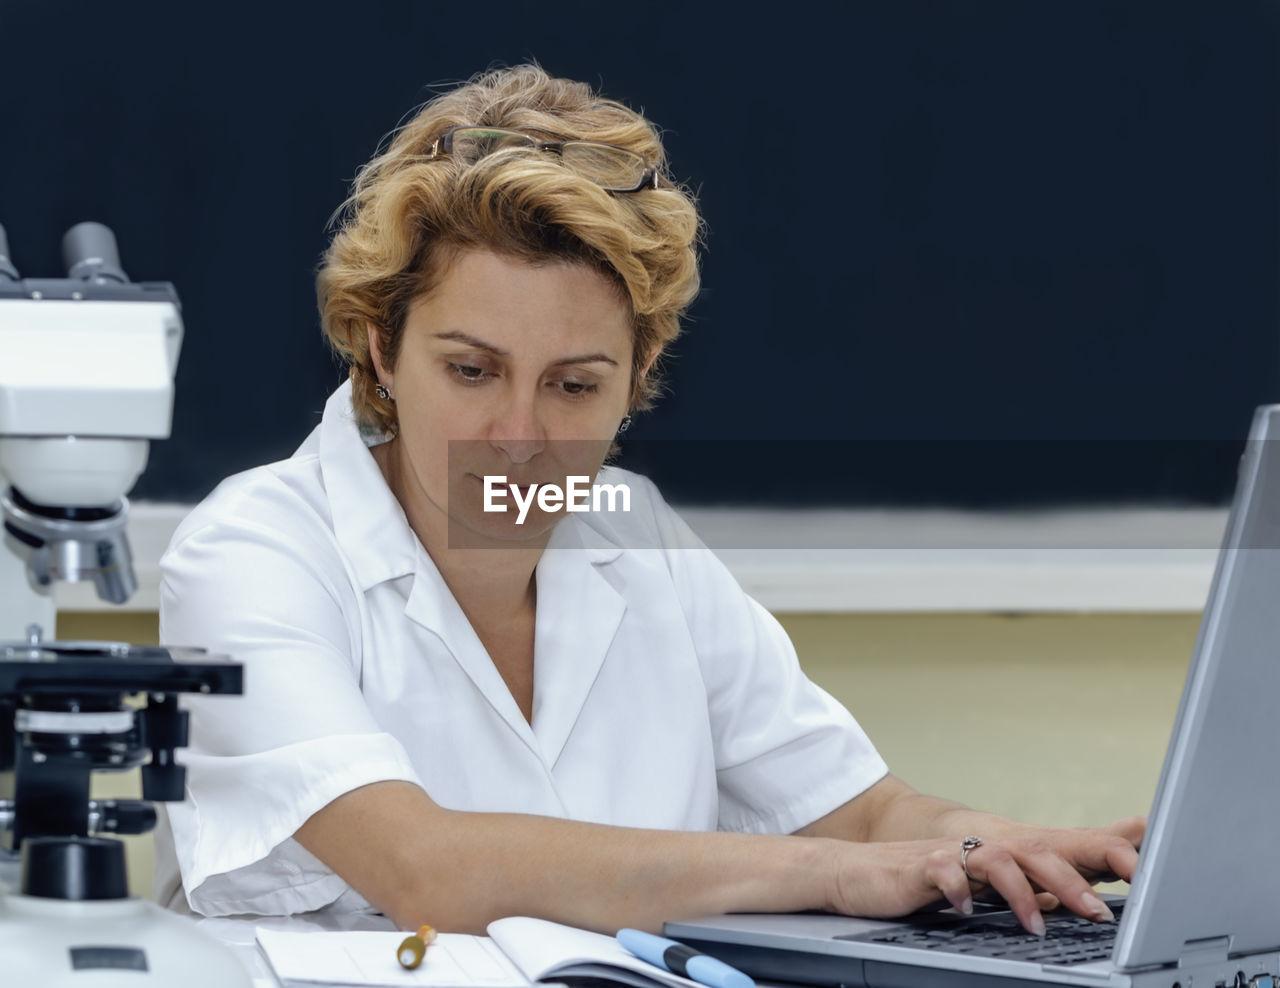 Scientist using laptop at laboratory